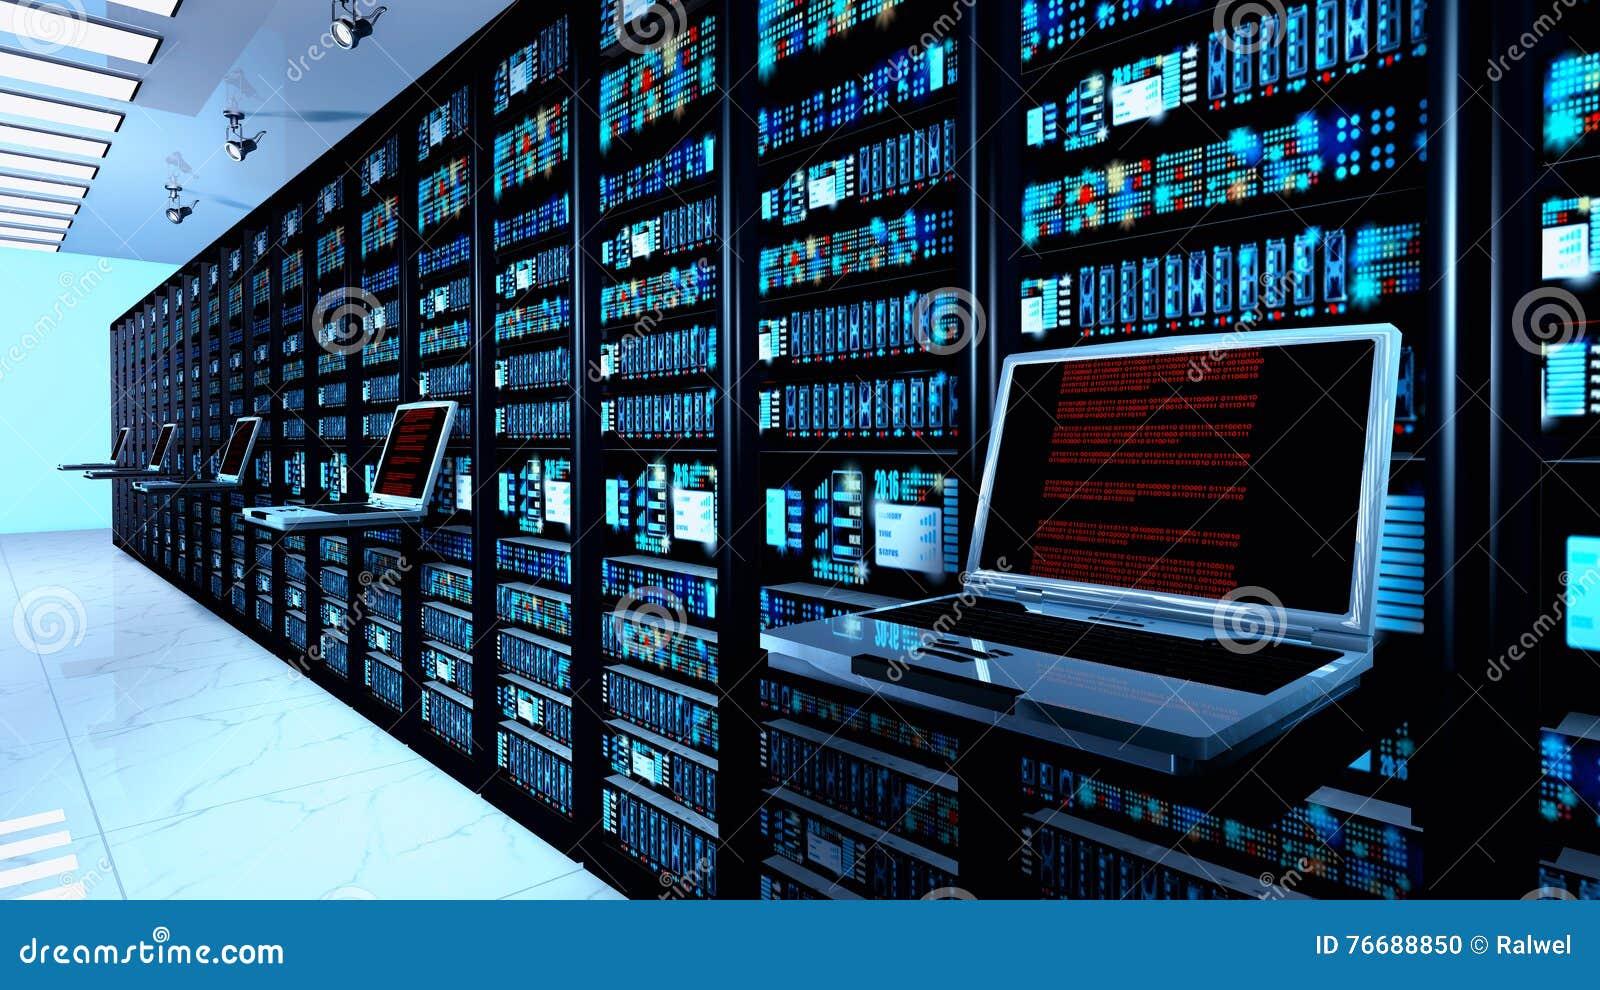 Eindmonitor in serverruimte met serverrekken in datacenterbinnenland